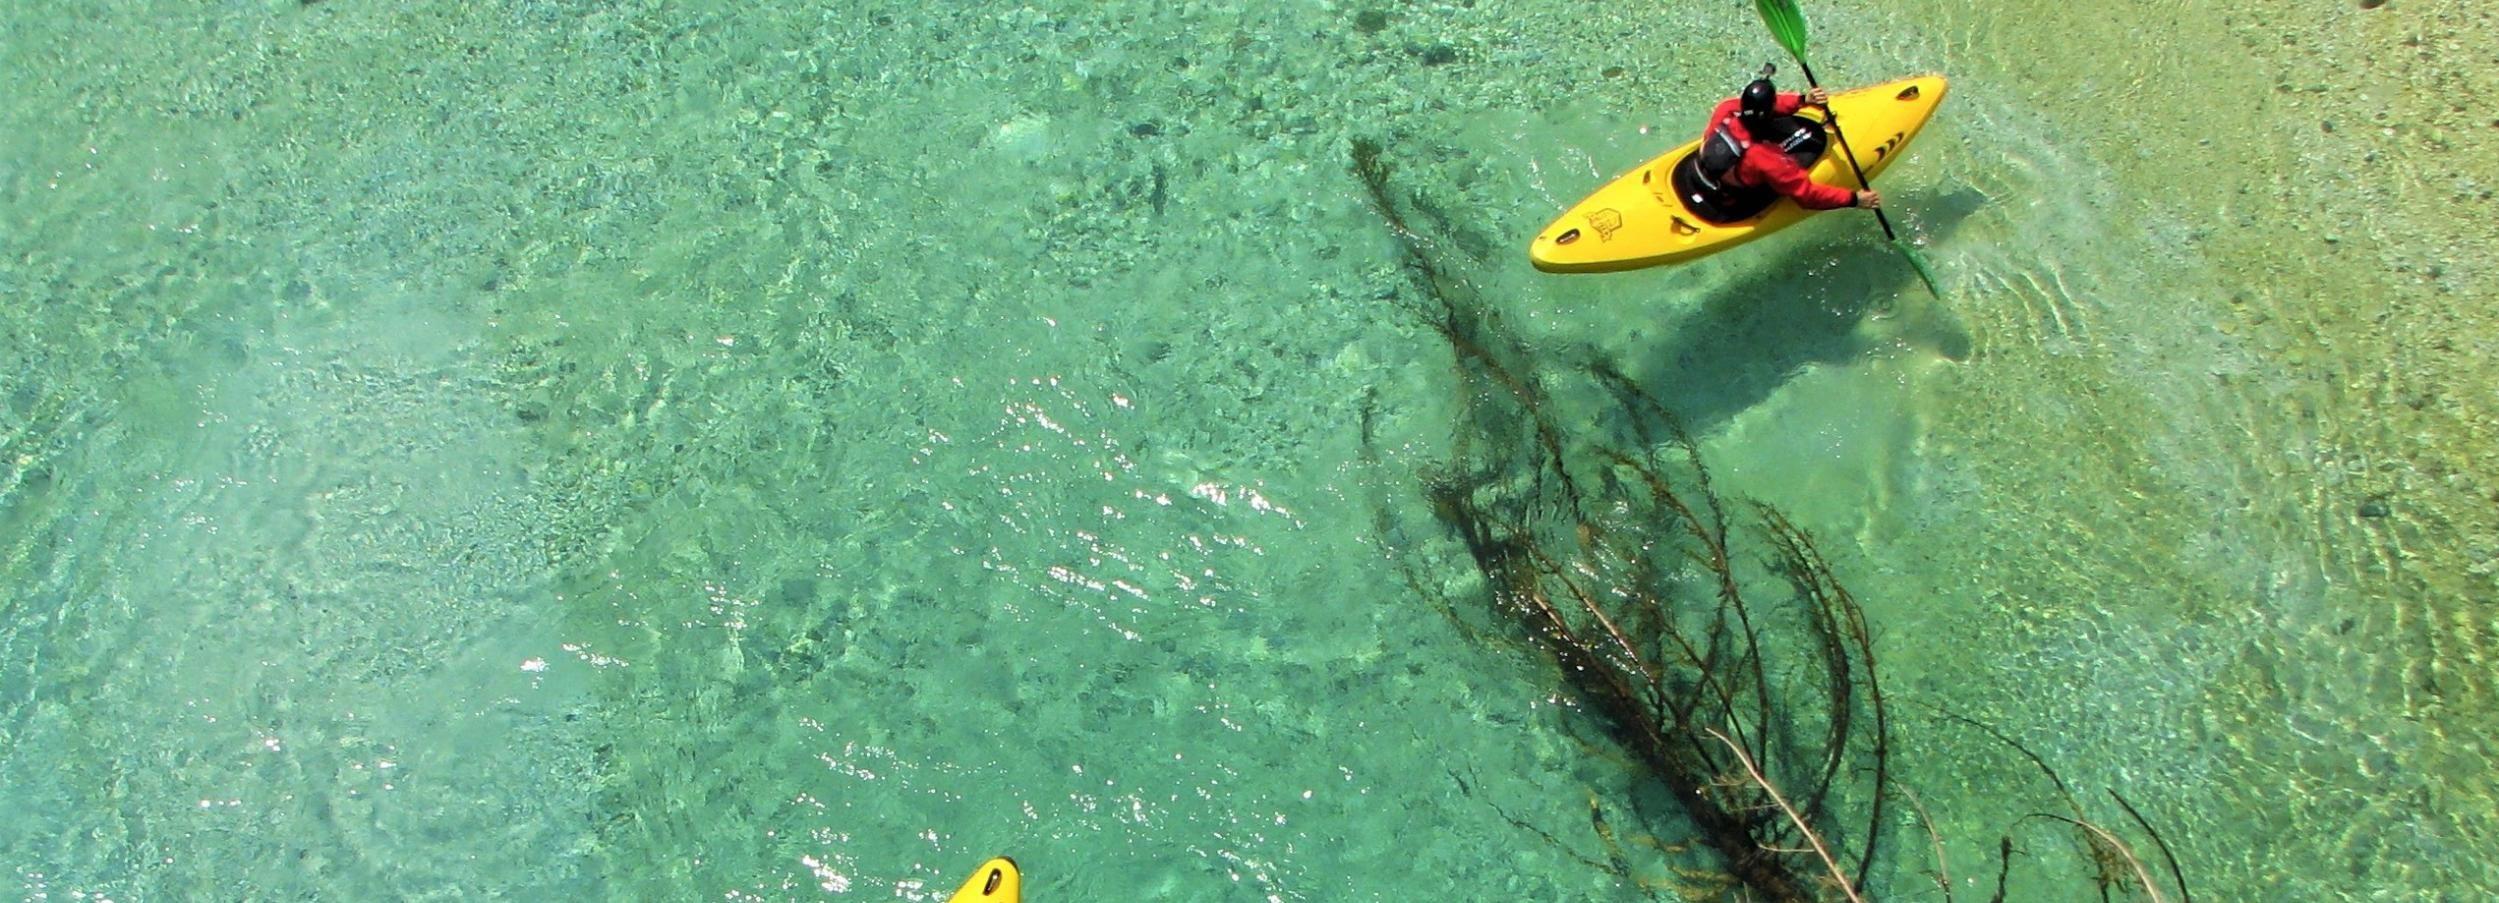 Bovec: Soča River 1-Day Beginners Kayak Course